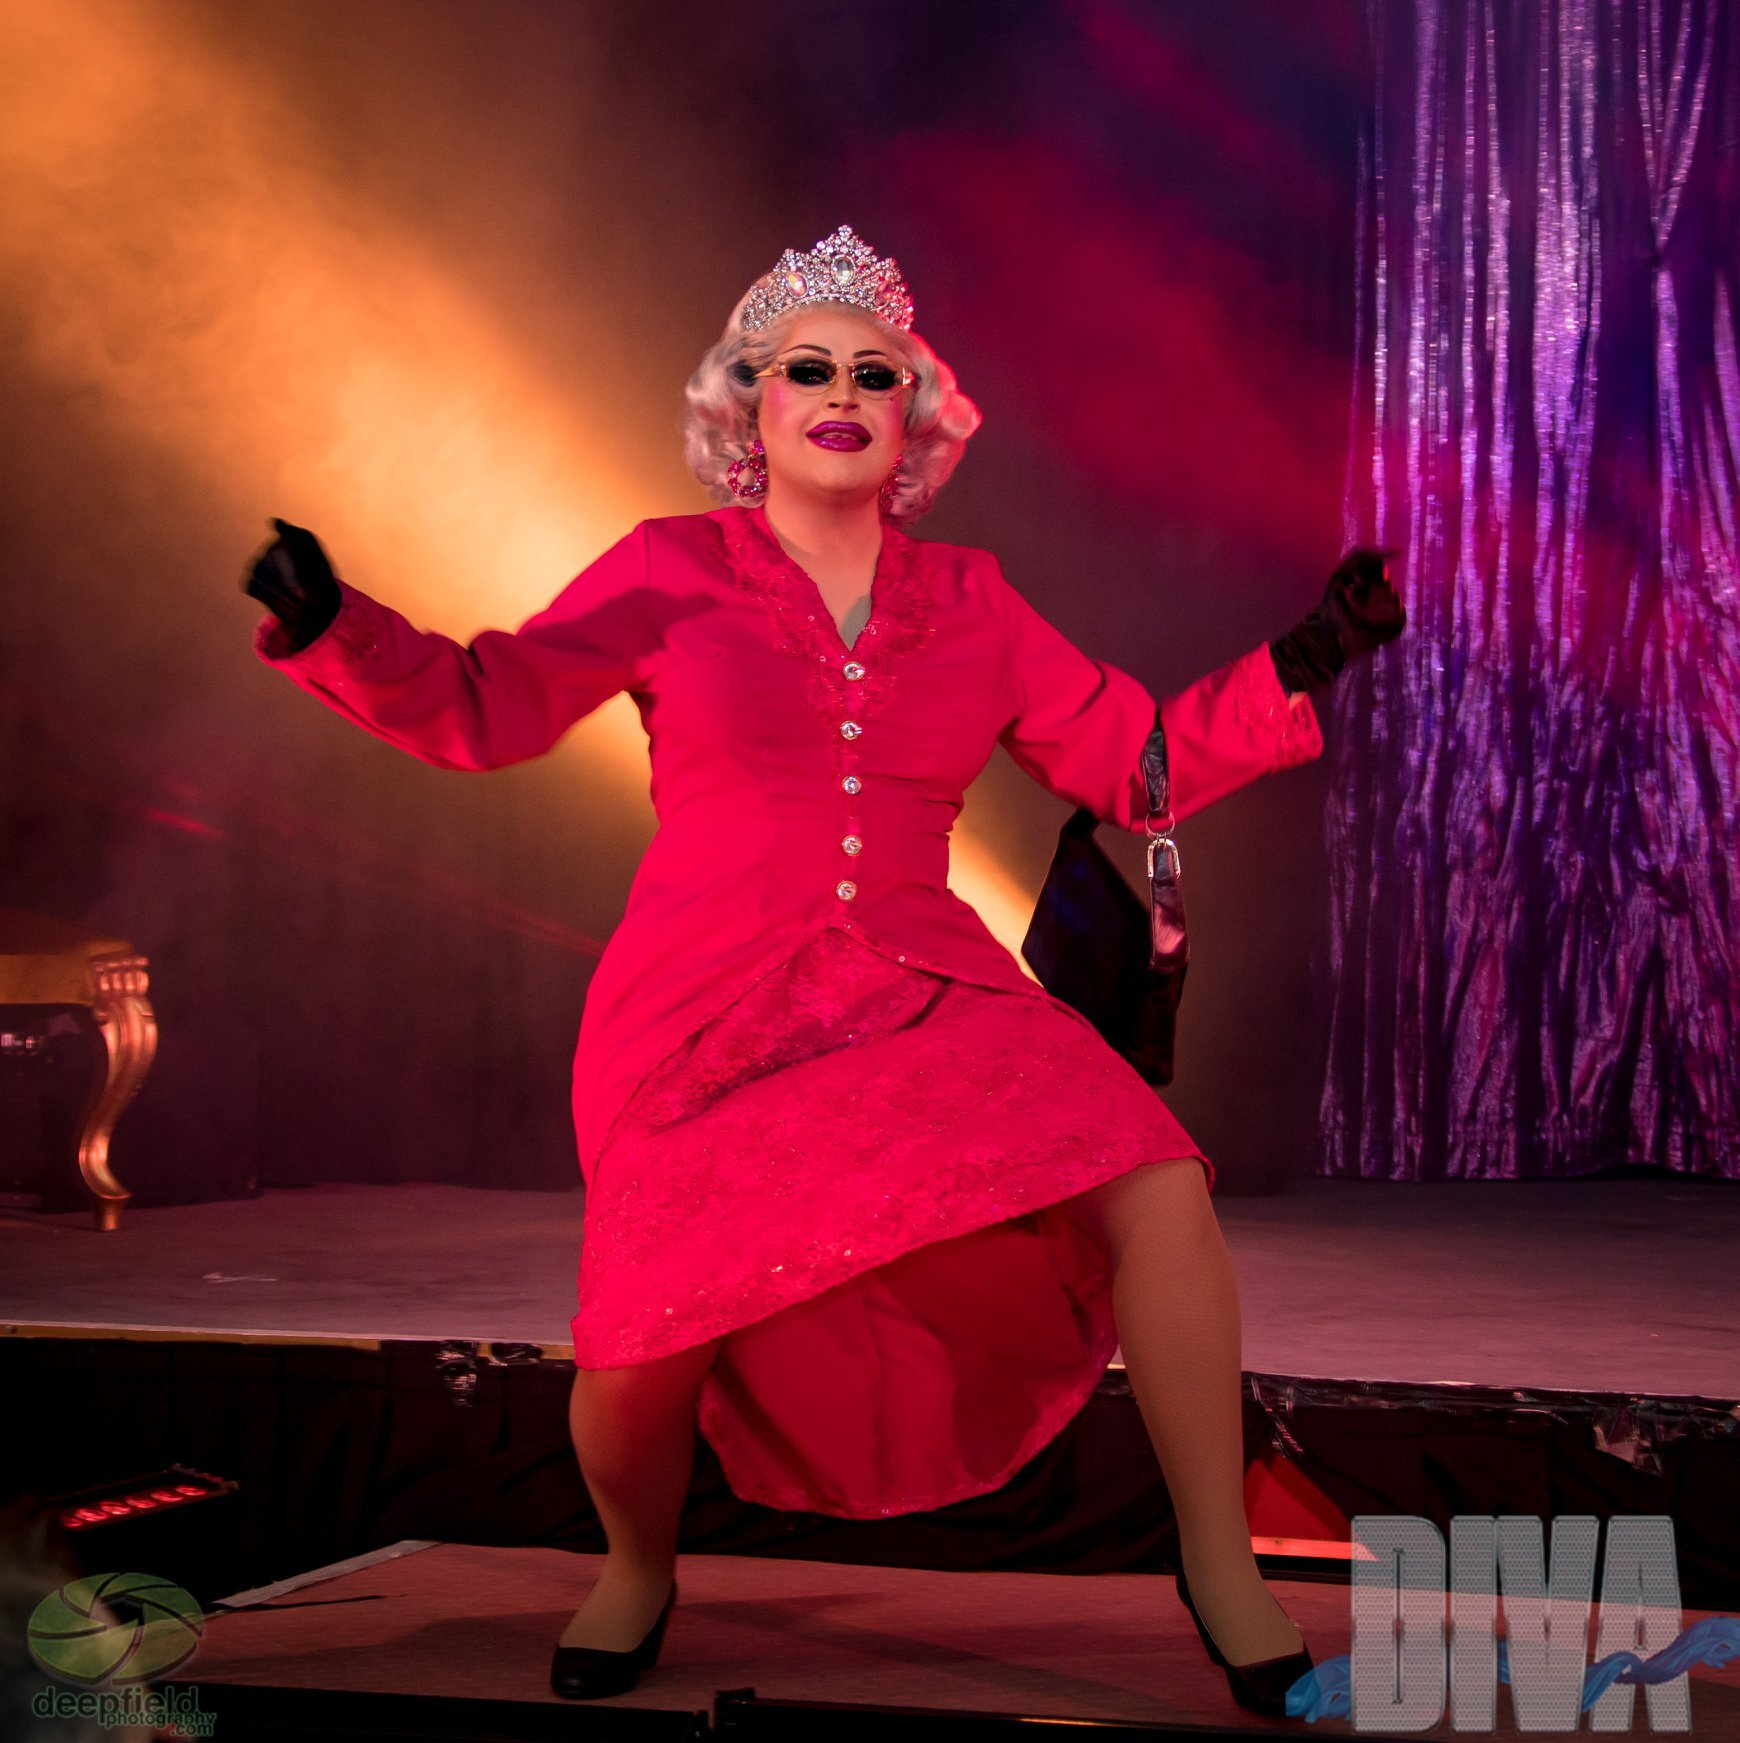 hannah-conda--queen-elizabeth-second-uk-diva-awards-sydney-drag-queen-royalty-best-hire-drag-race-australia-6.jpg